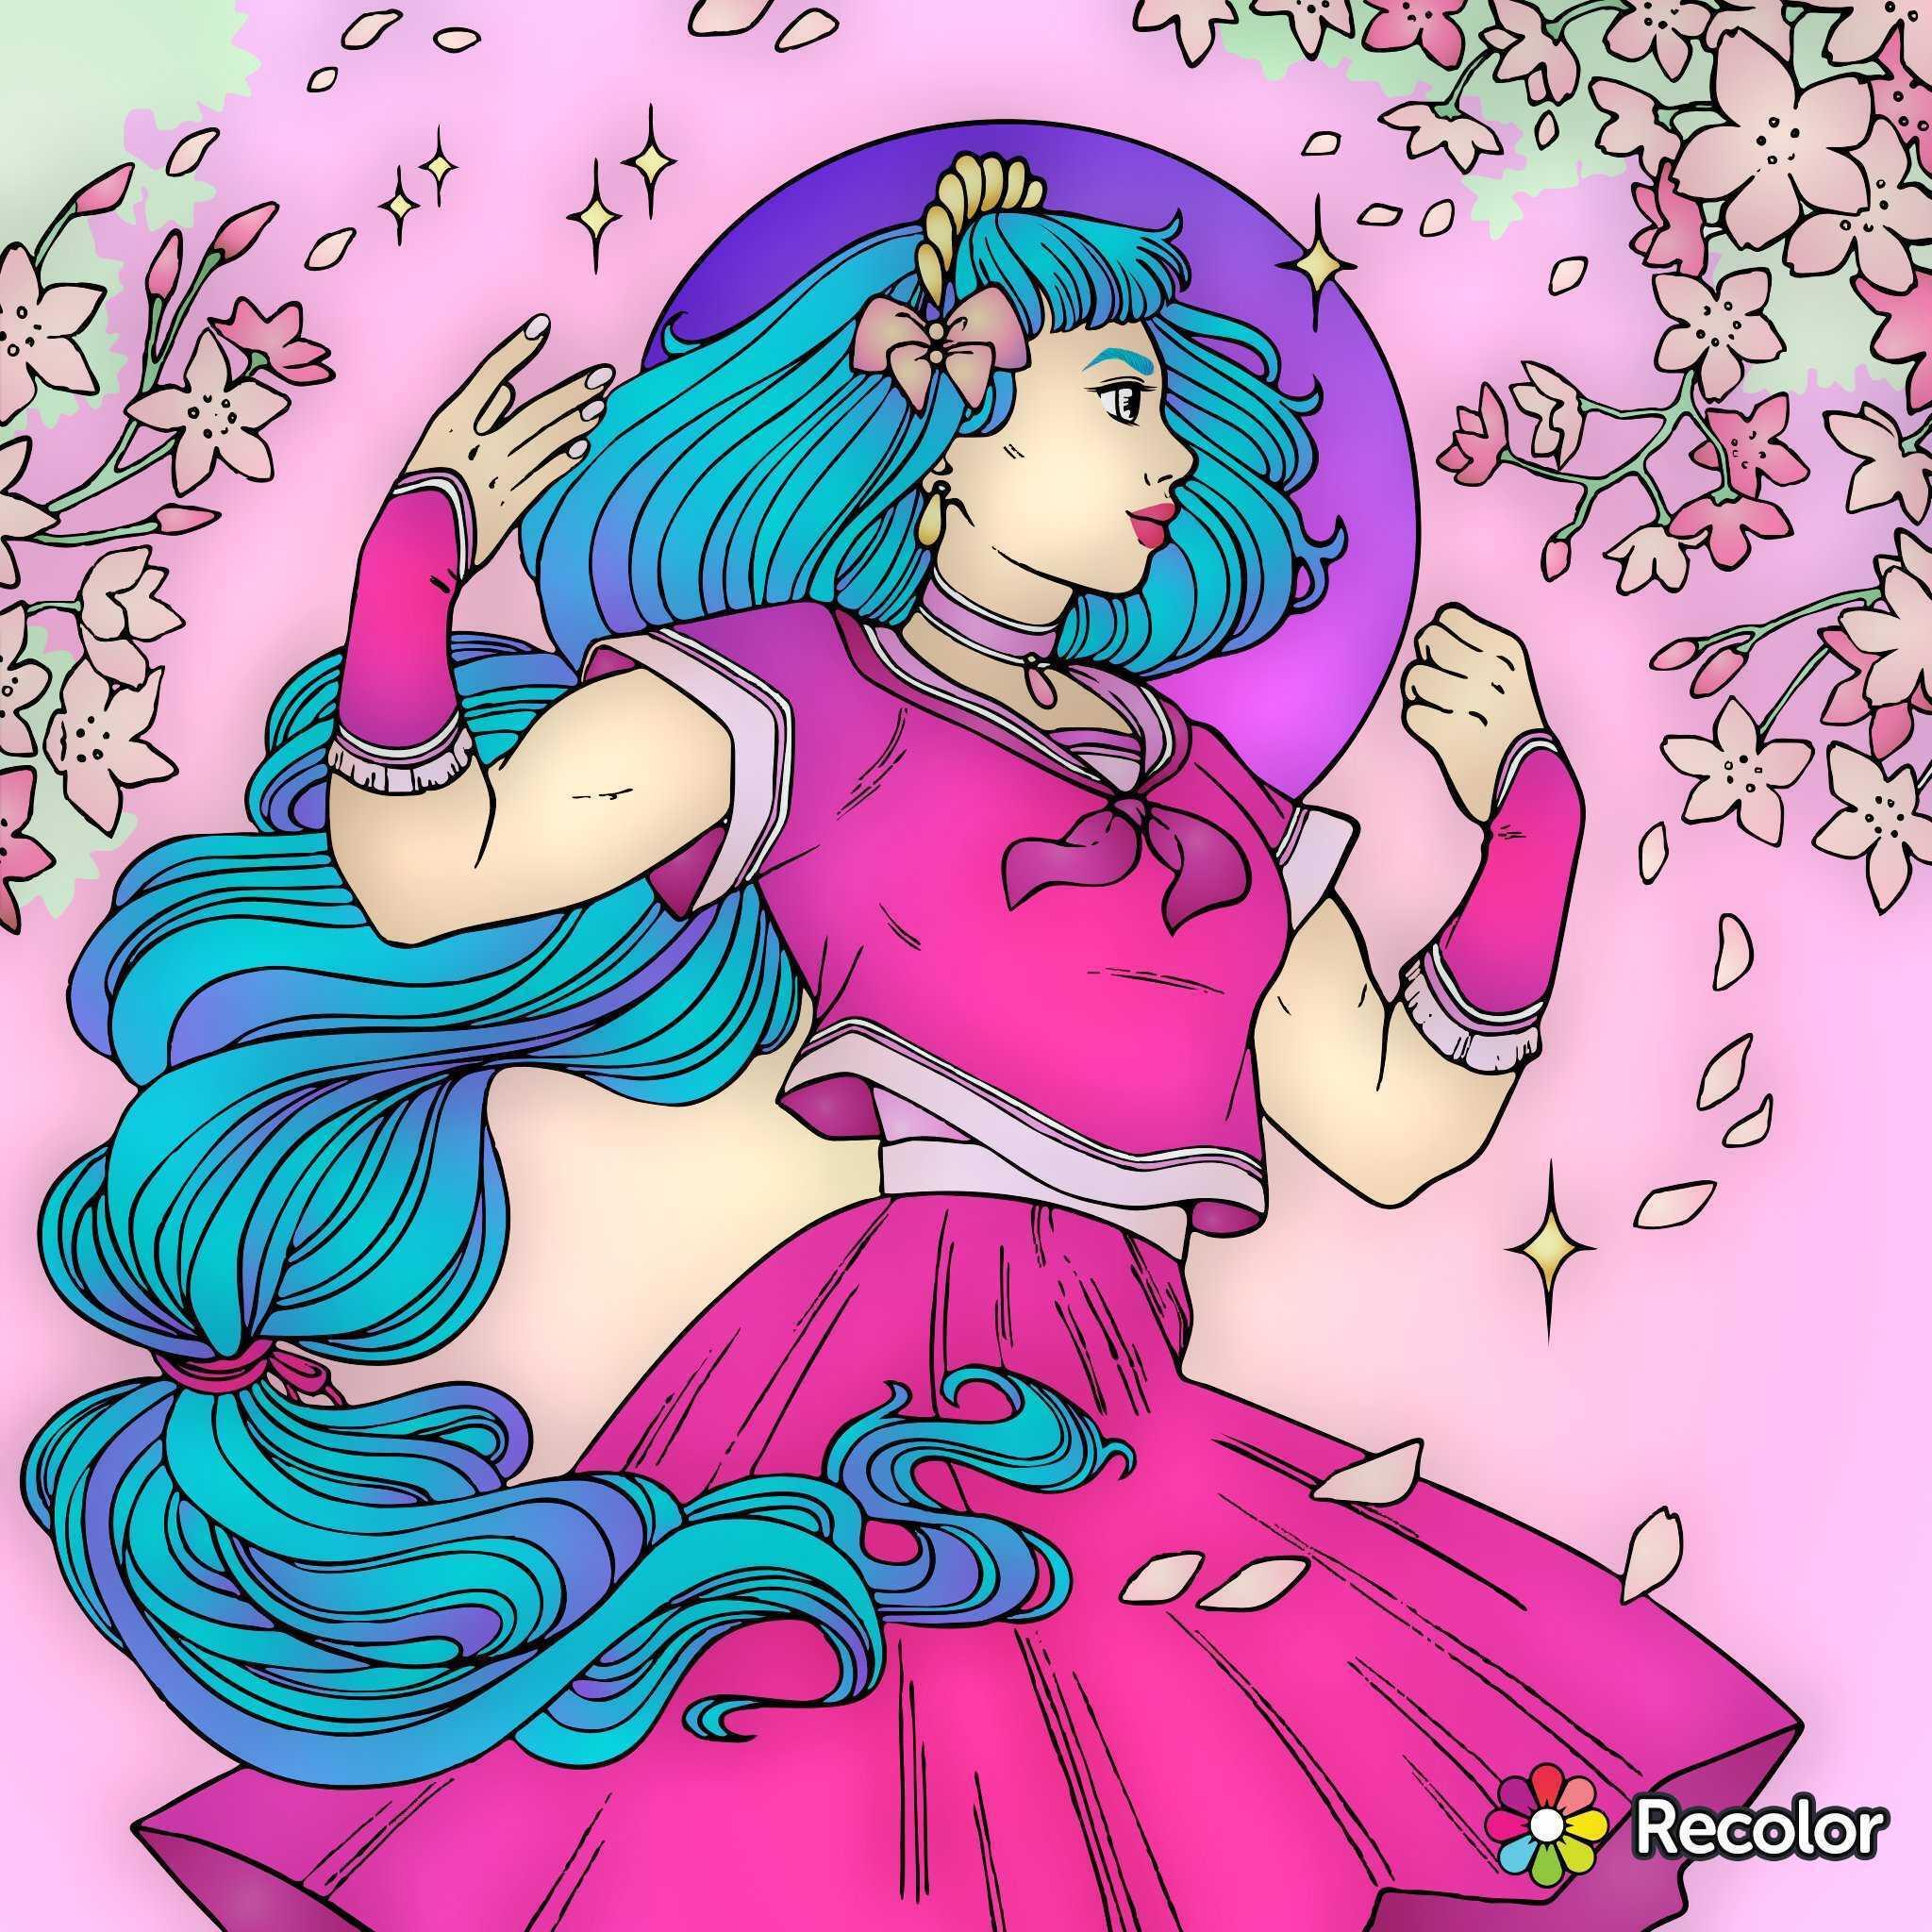 Gaga for Manga!